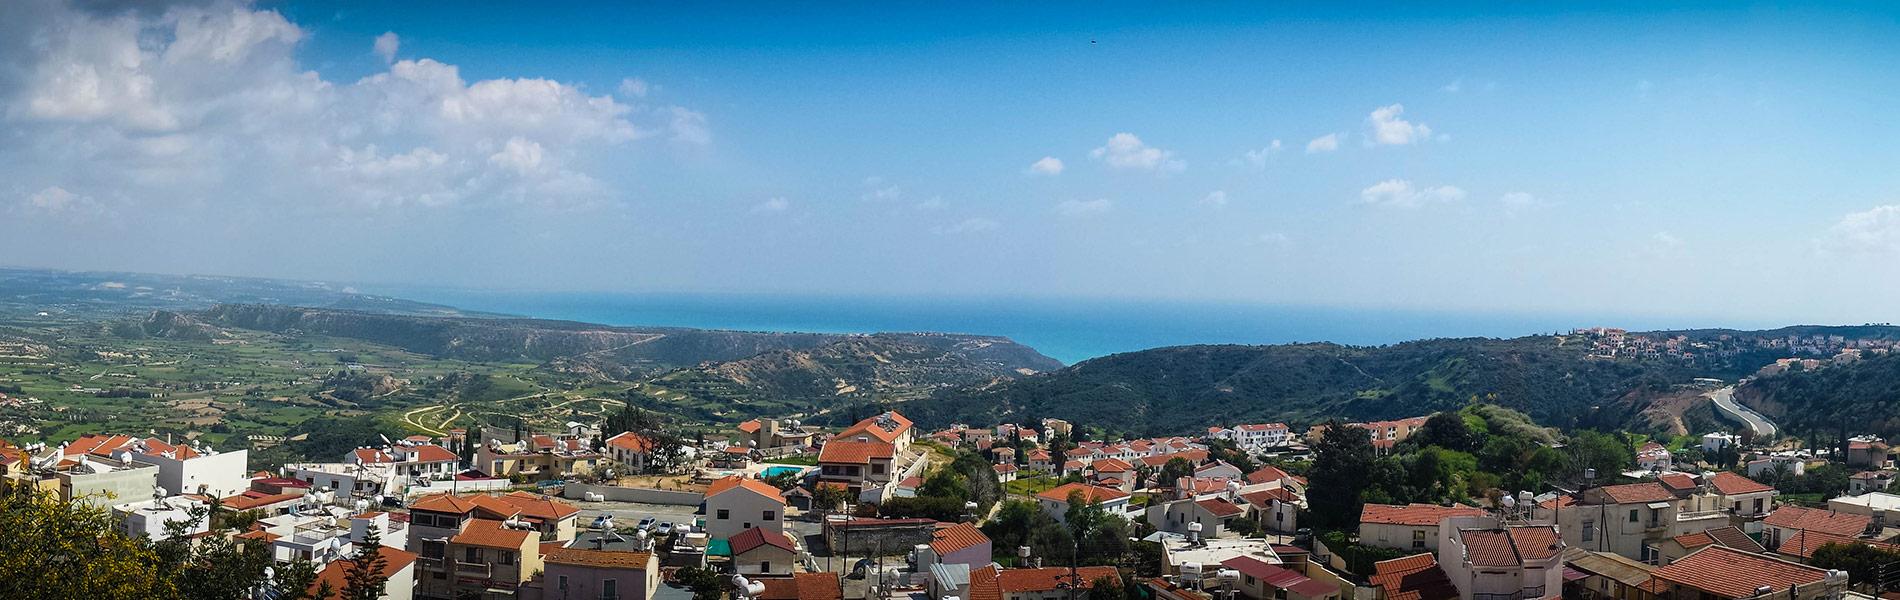 Pissouri's Unique Views ...